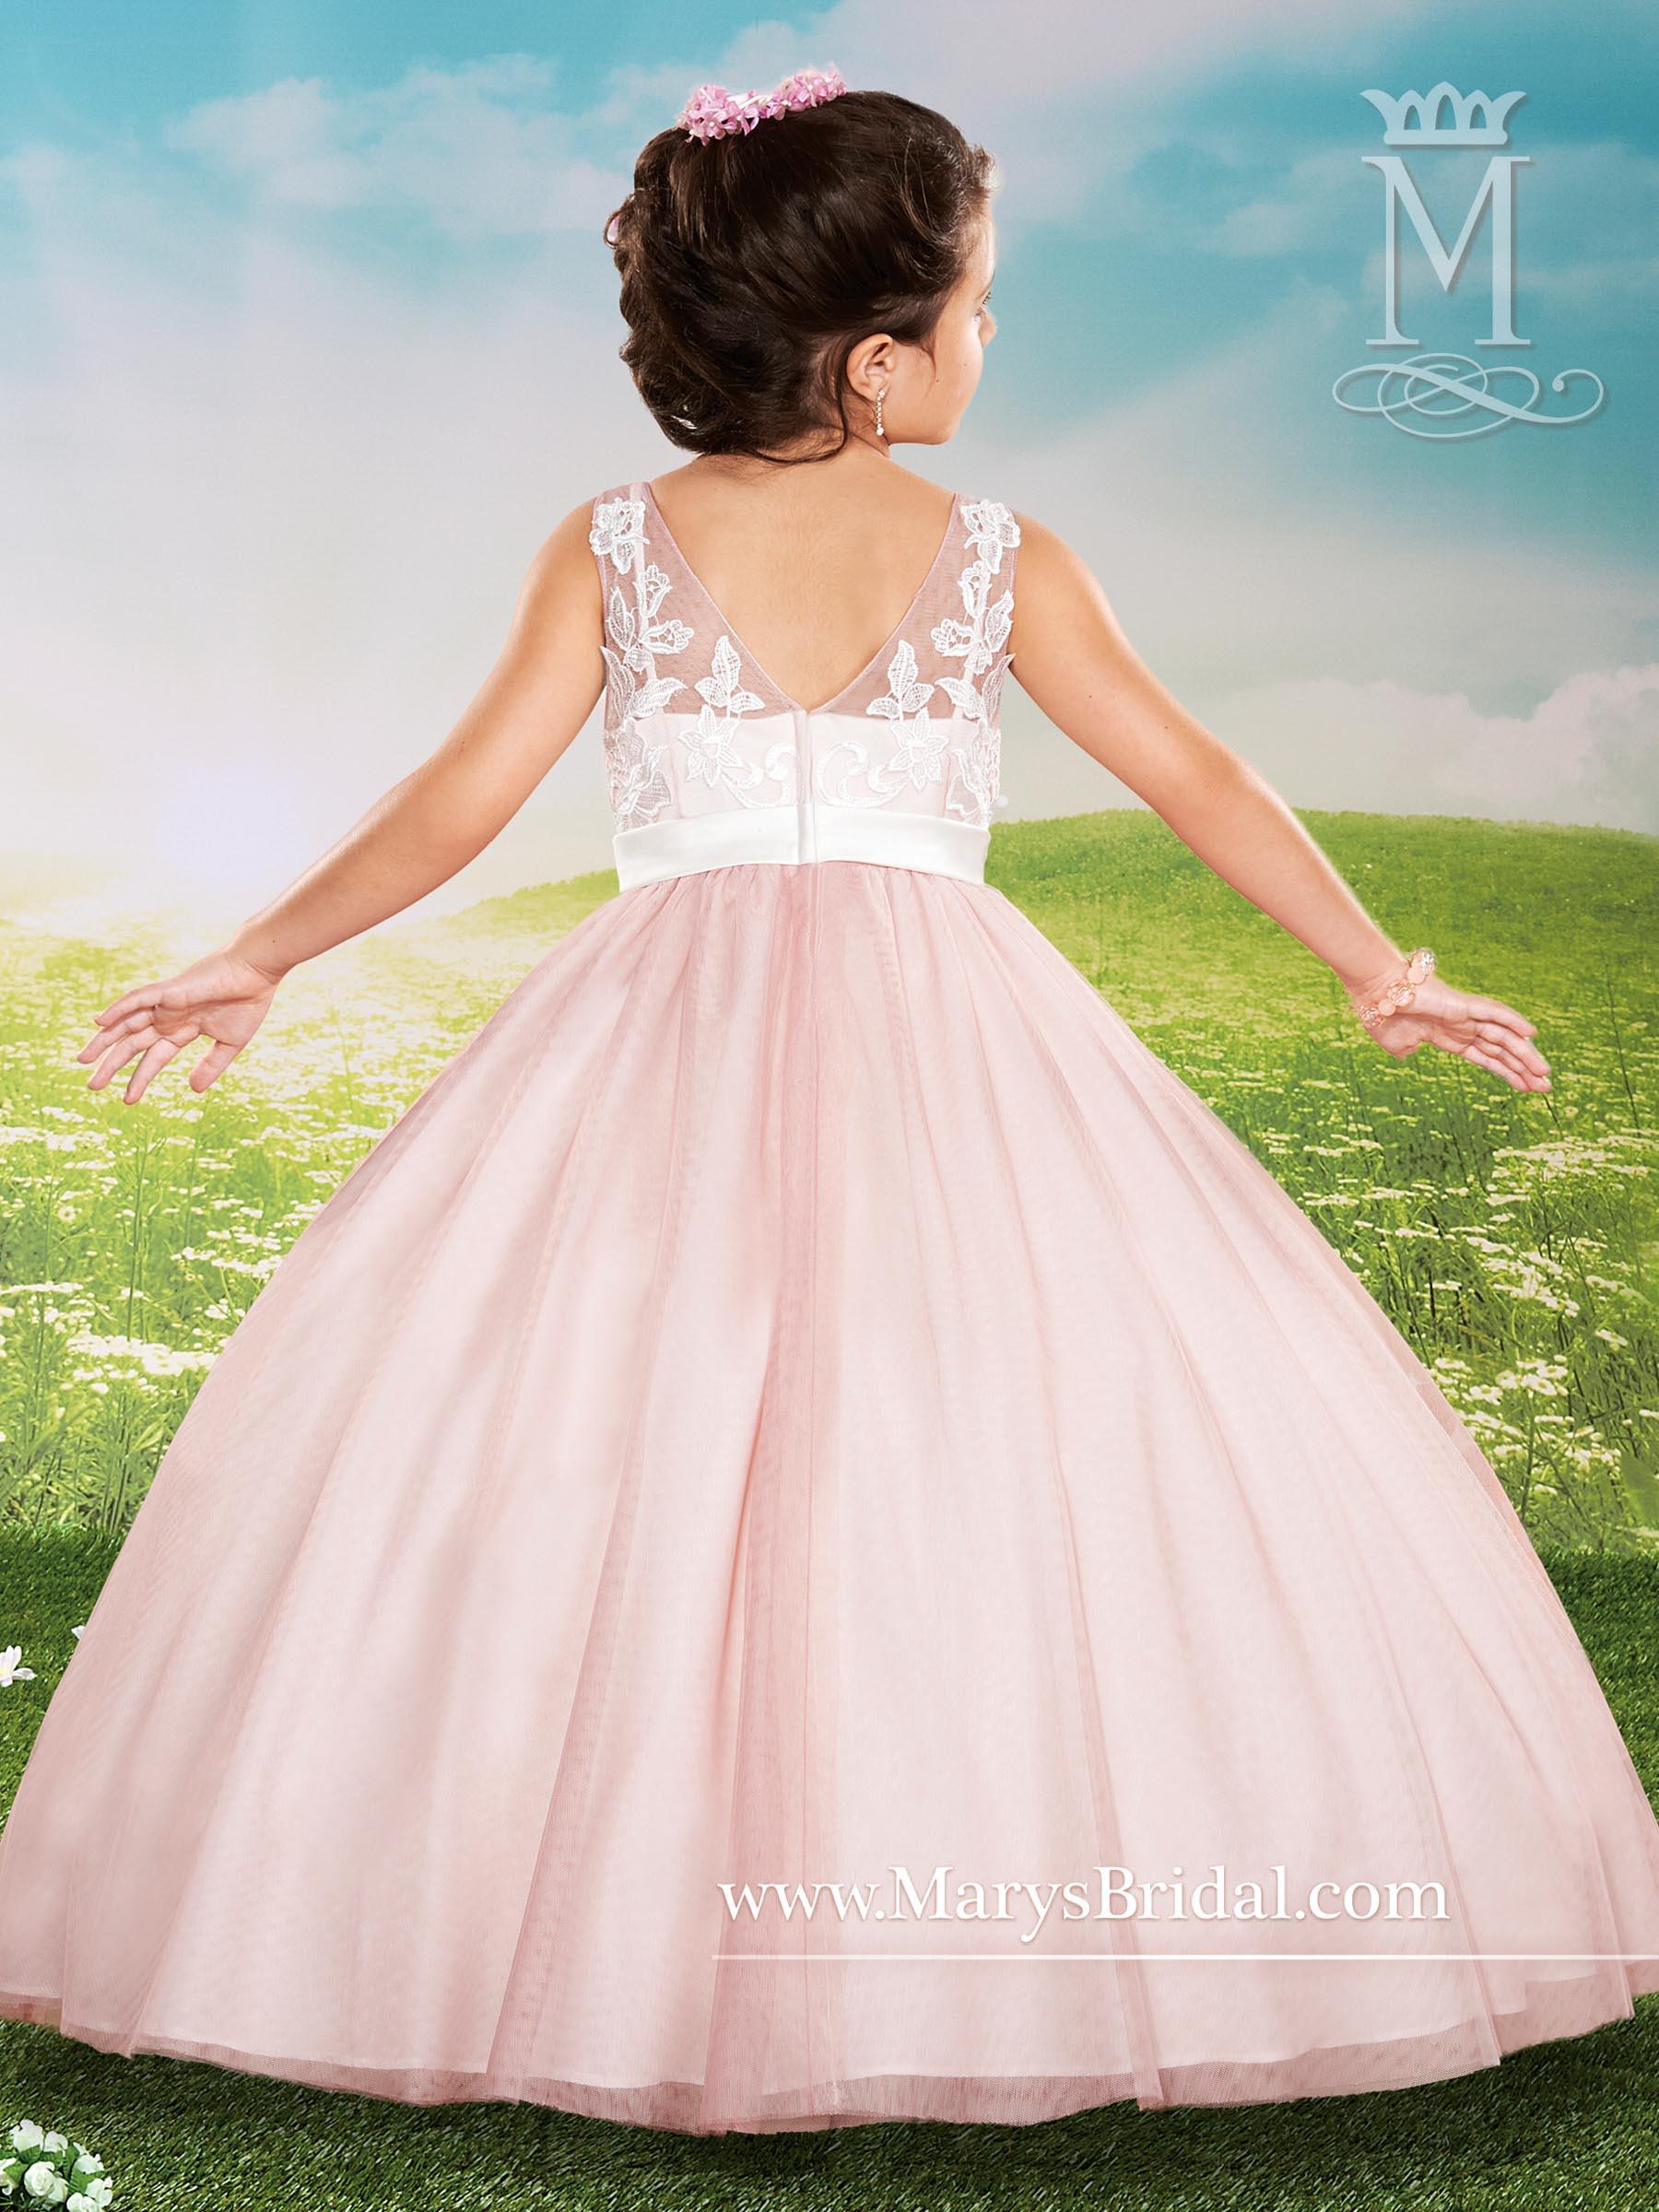 e99226fcd Presentación – 3 años – Vestidos de fiesta - flower girl dresses